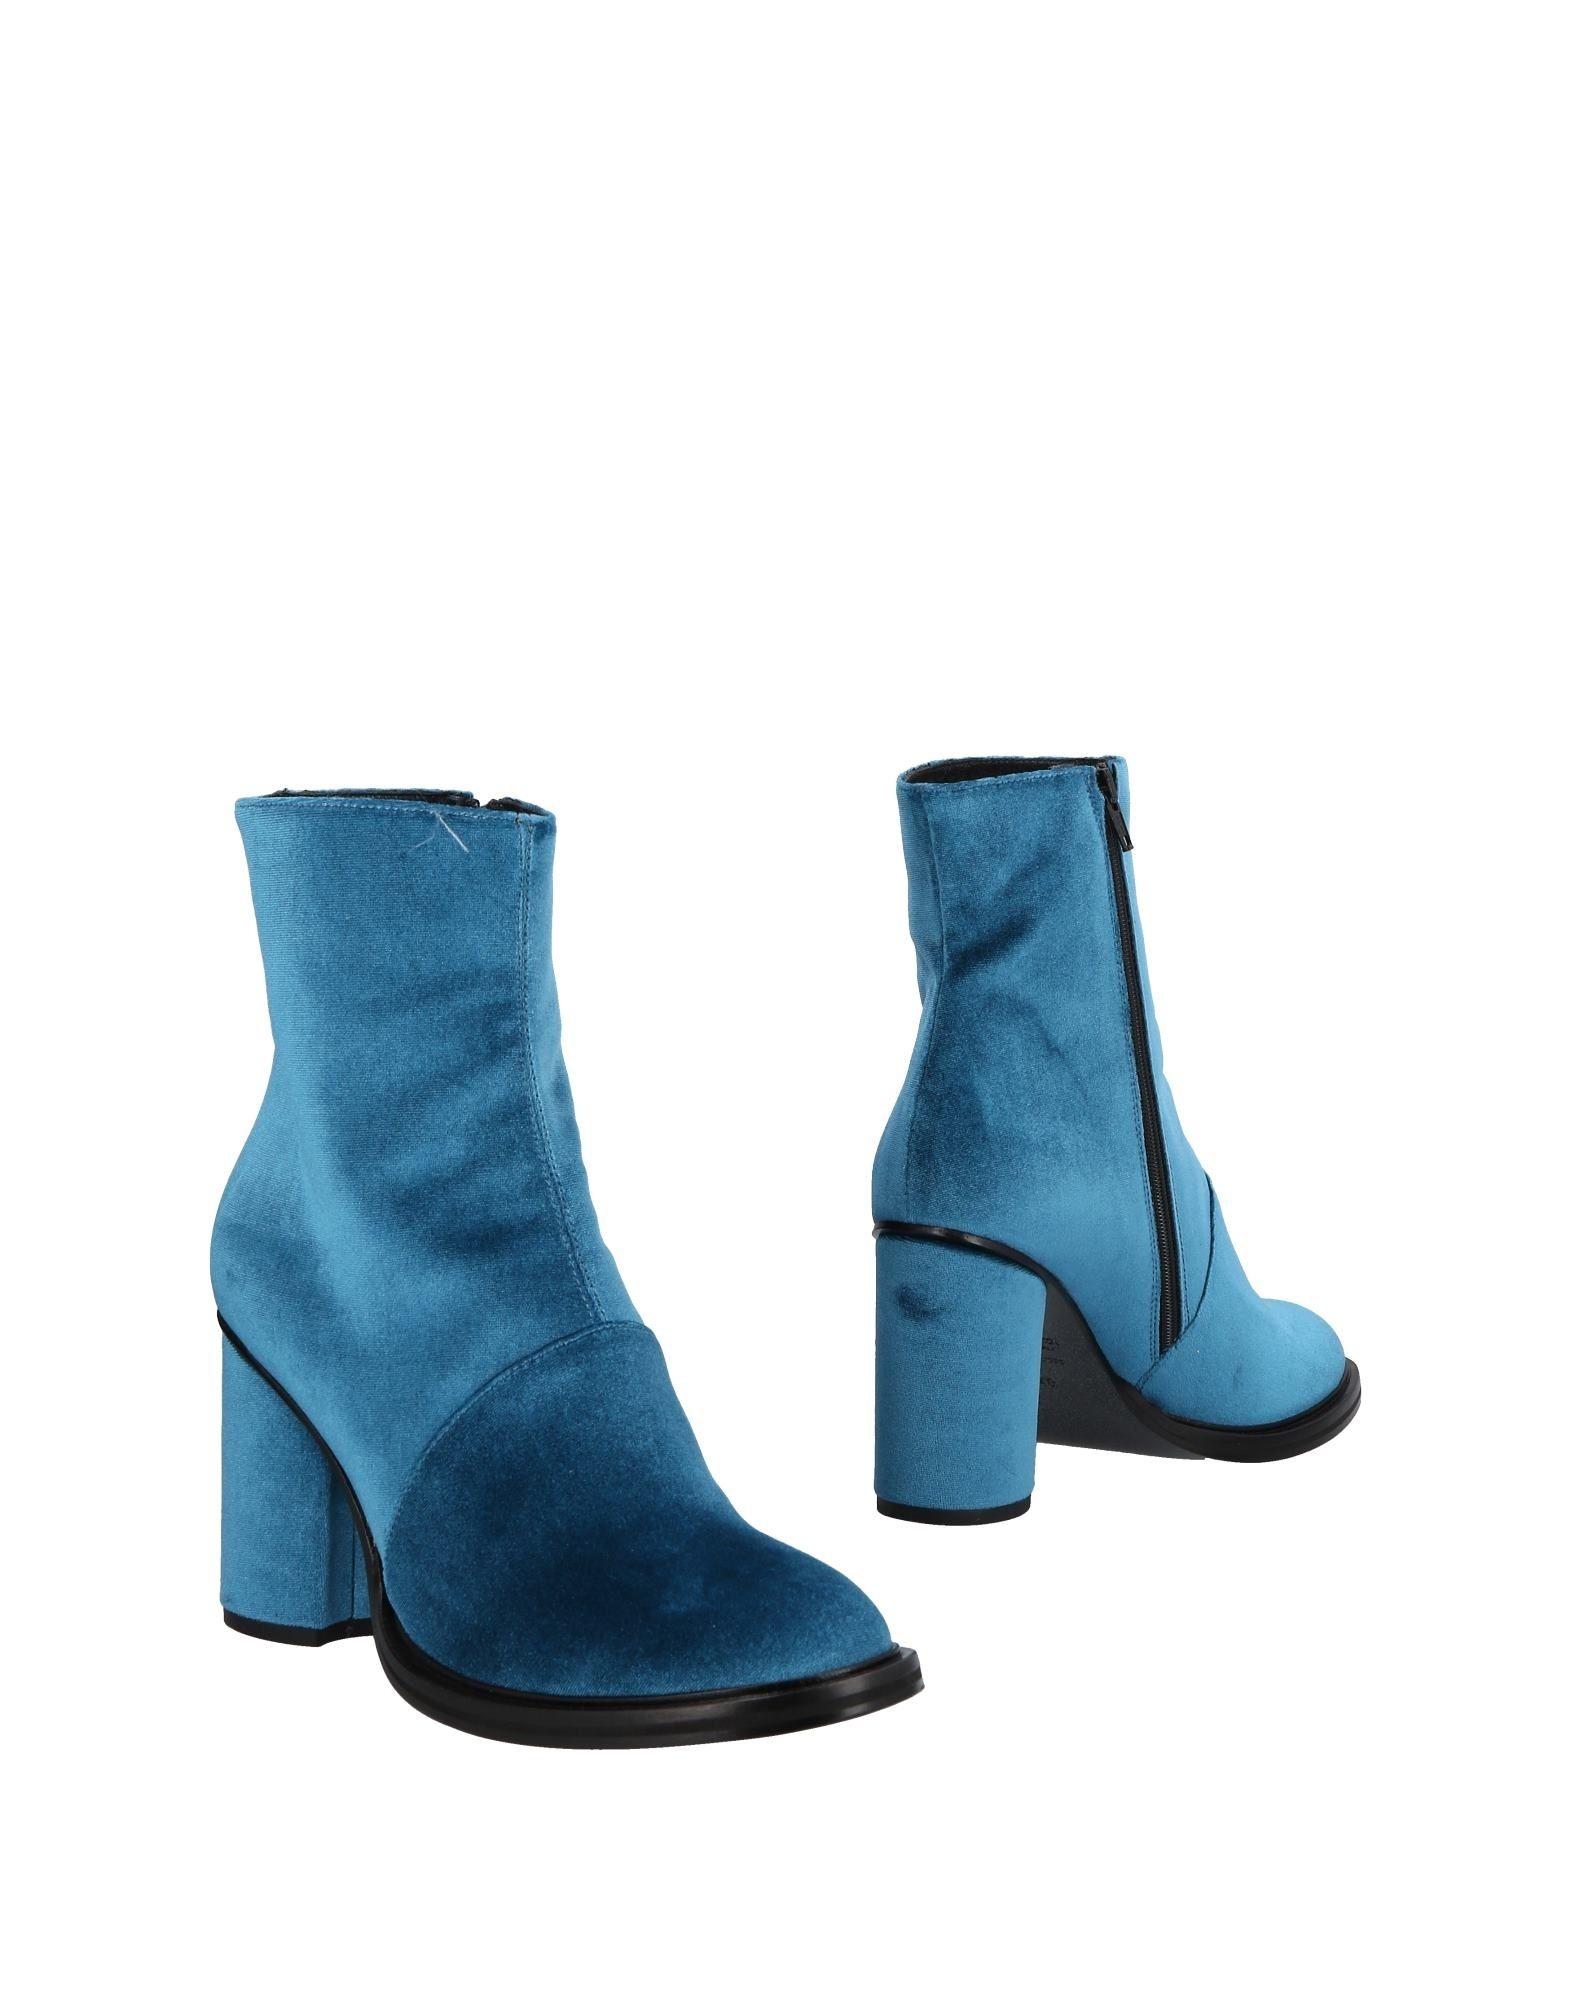 Stilvolle Tacchi billige Schuhe Tipe E Tacchi Stilvolle Stiefelette Damen  11482640CR 97ee75